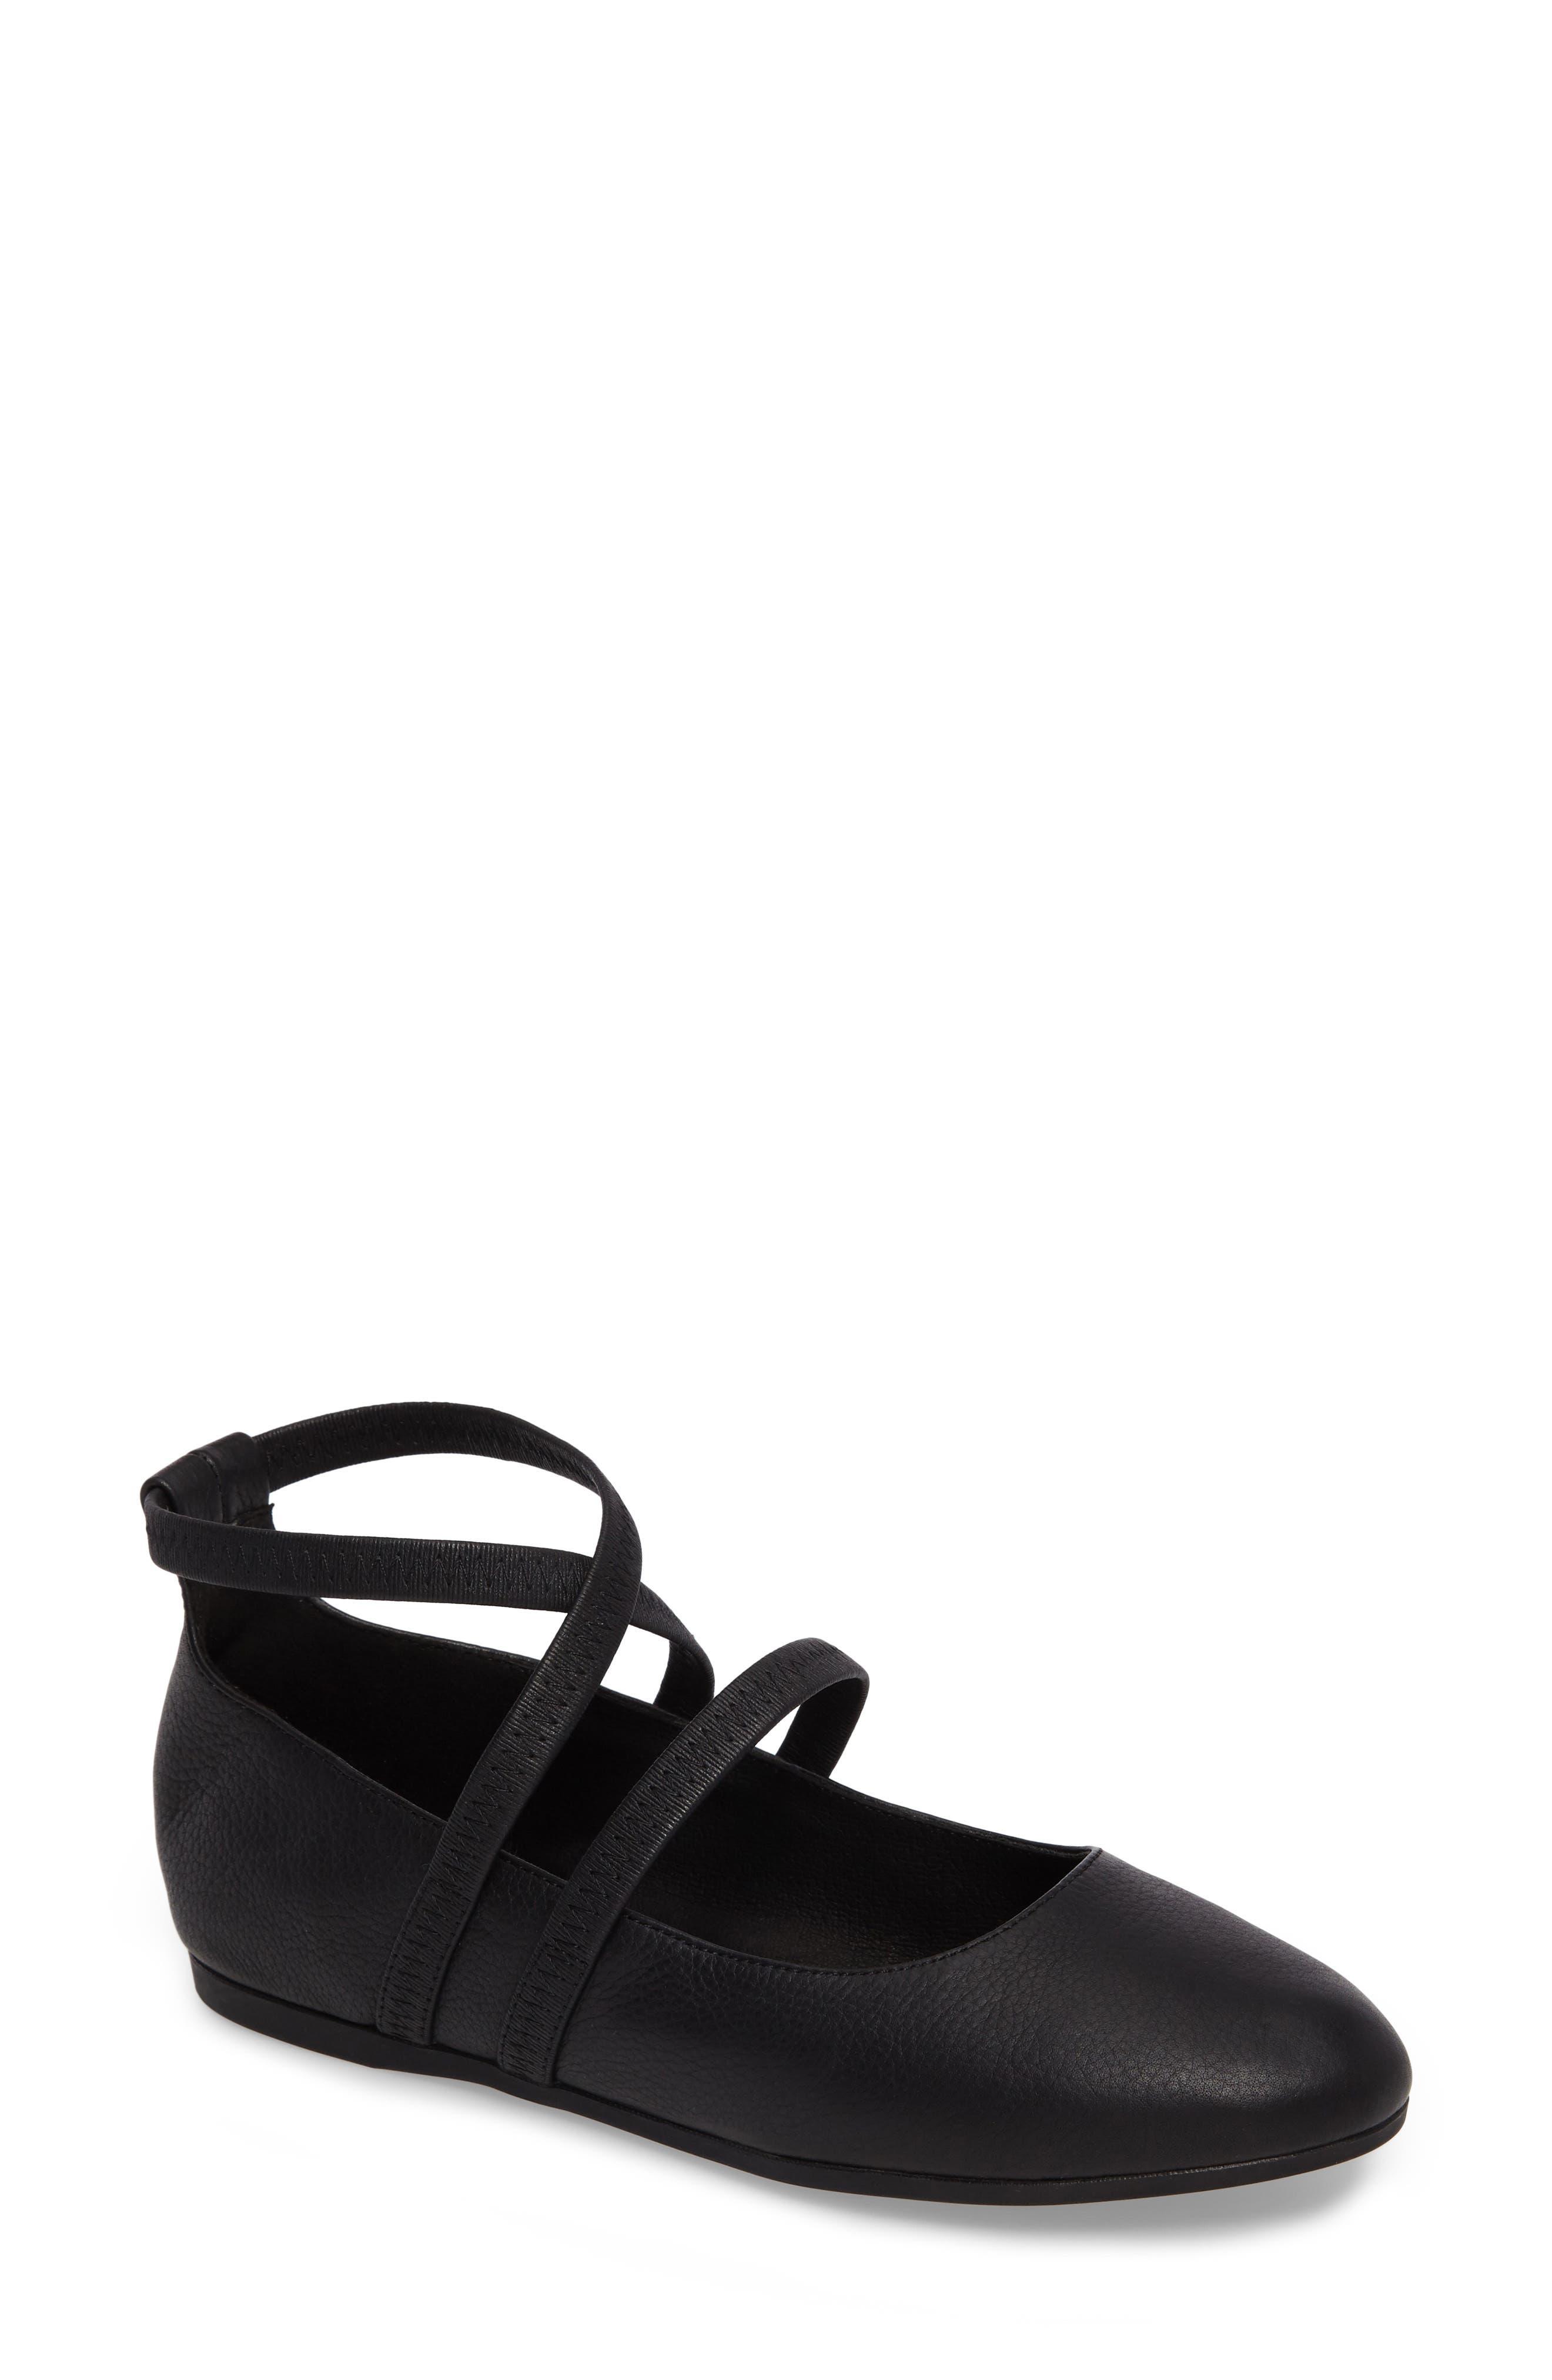 Joe Strappy Ballet Flat,                         Main,                         color, 001